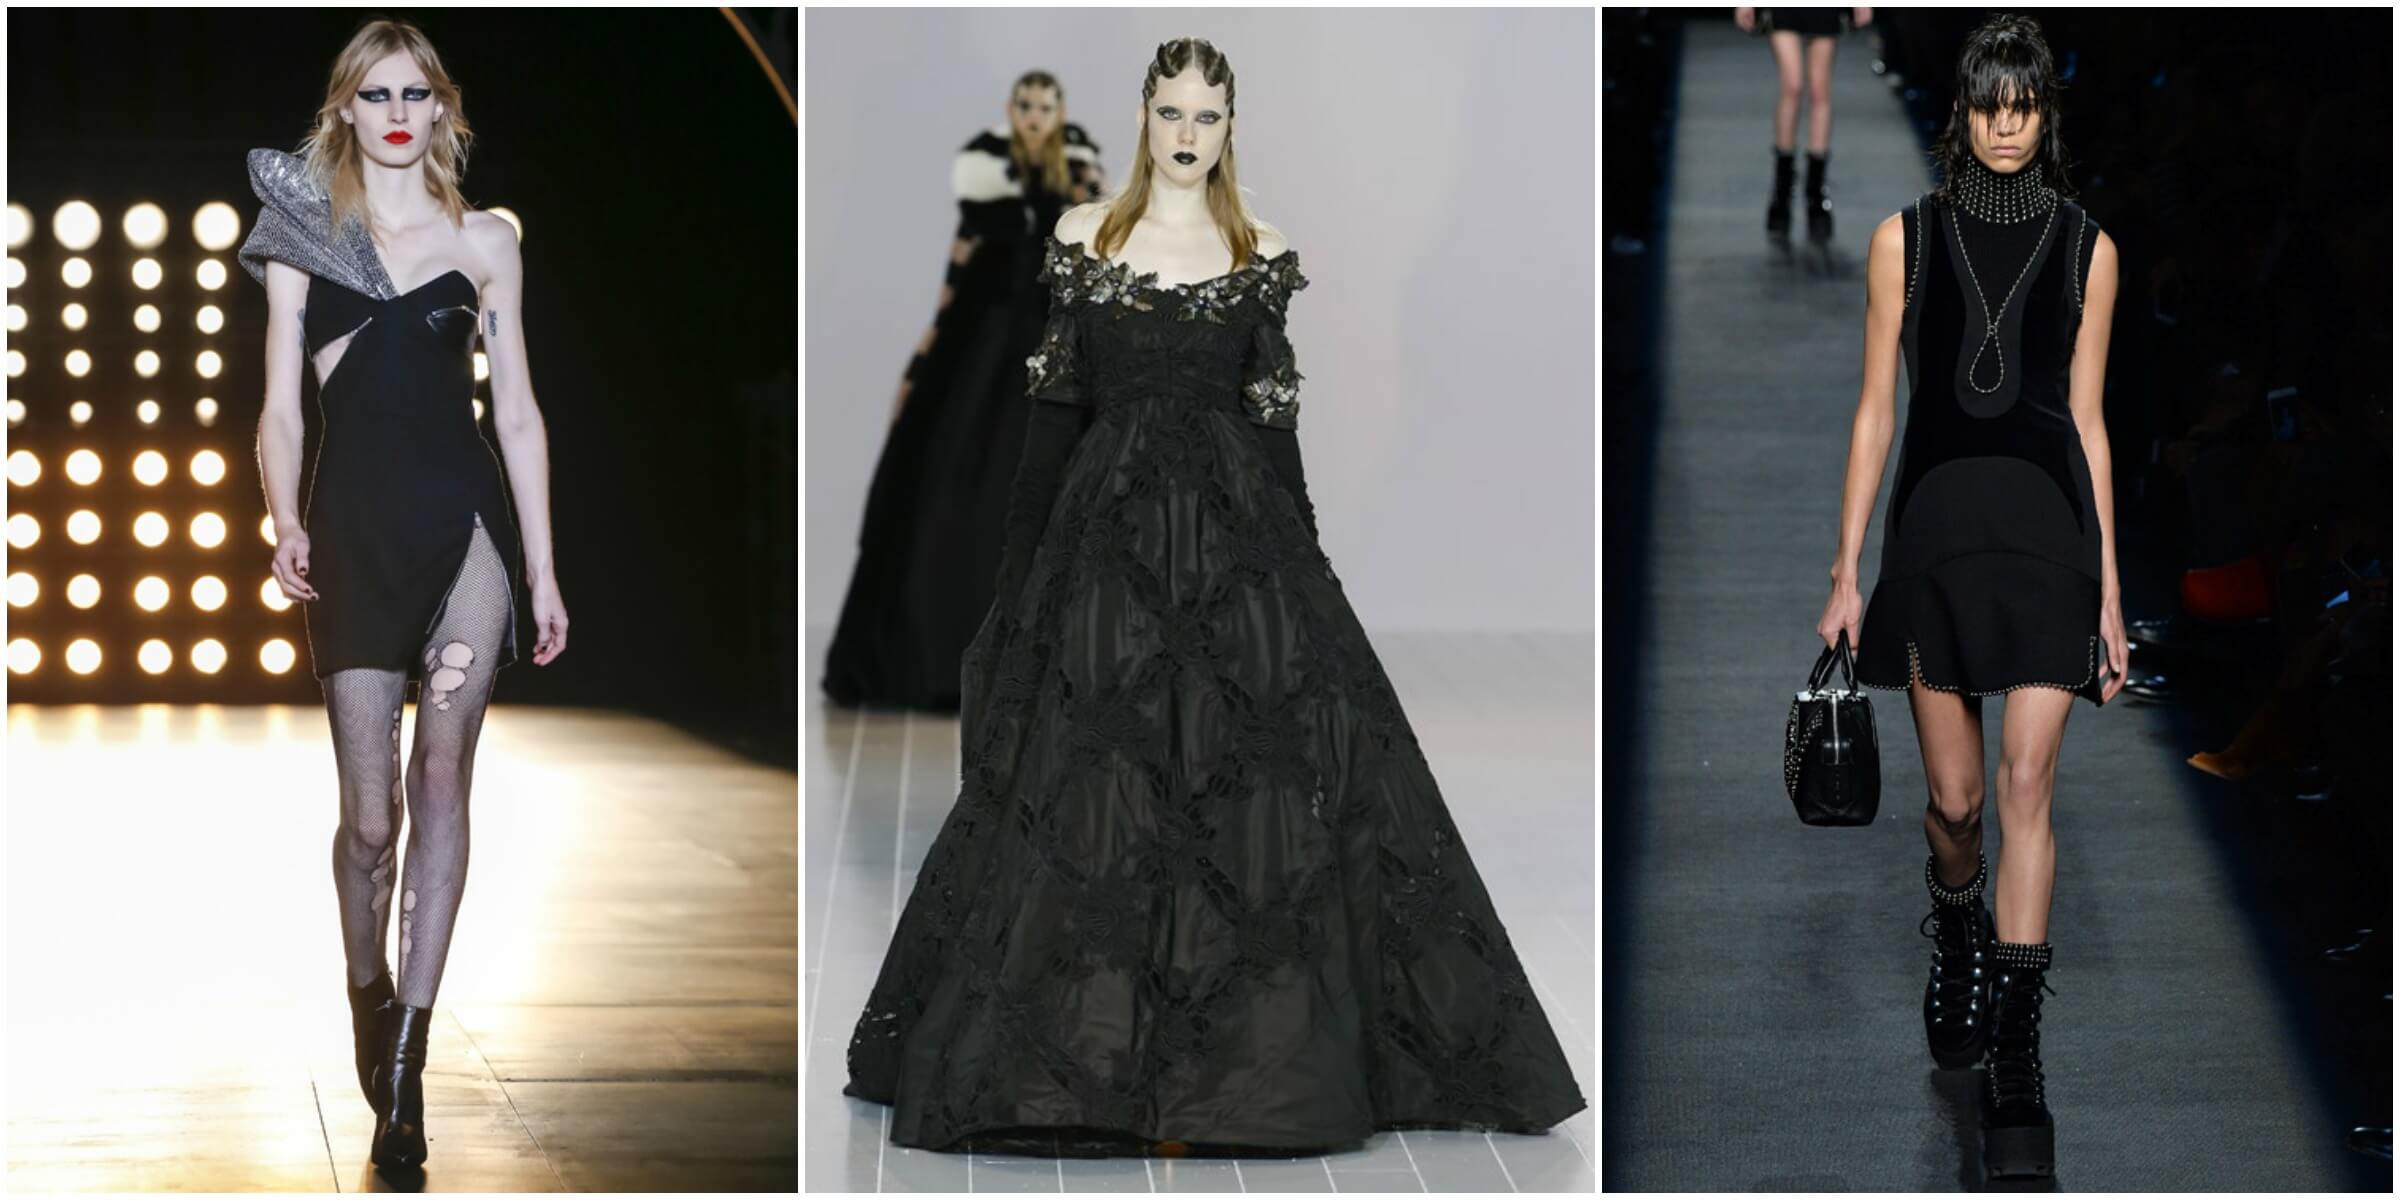 Saint Laurent FW16 via Vogue; Marc Jacobs FW16 via Vogue; Alexander Wang FW16 via Vogue